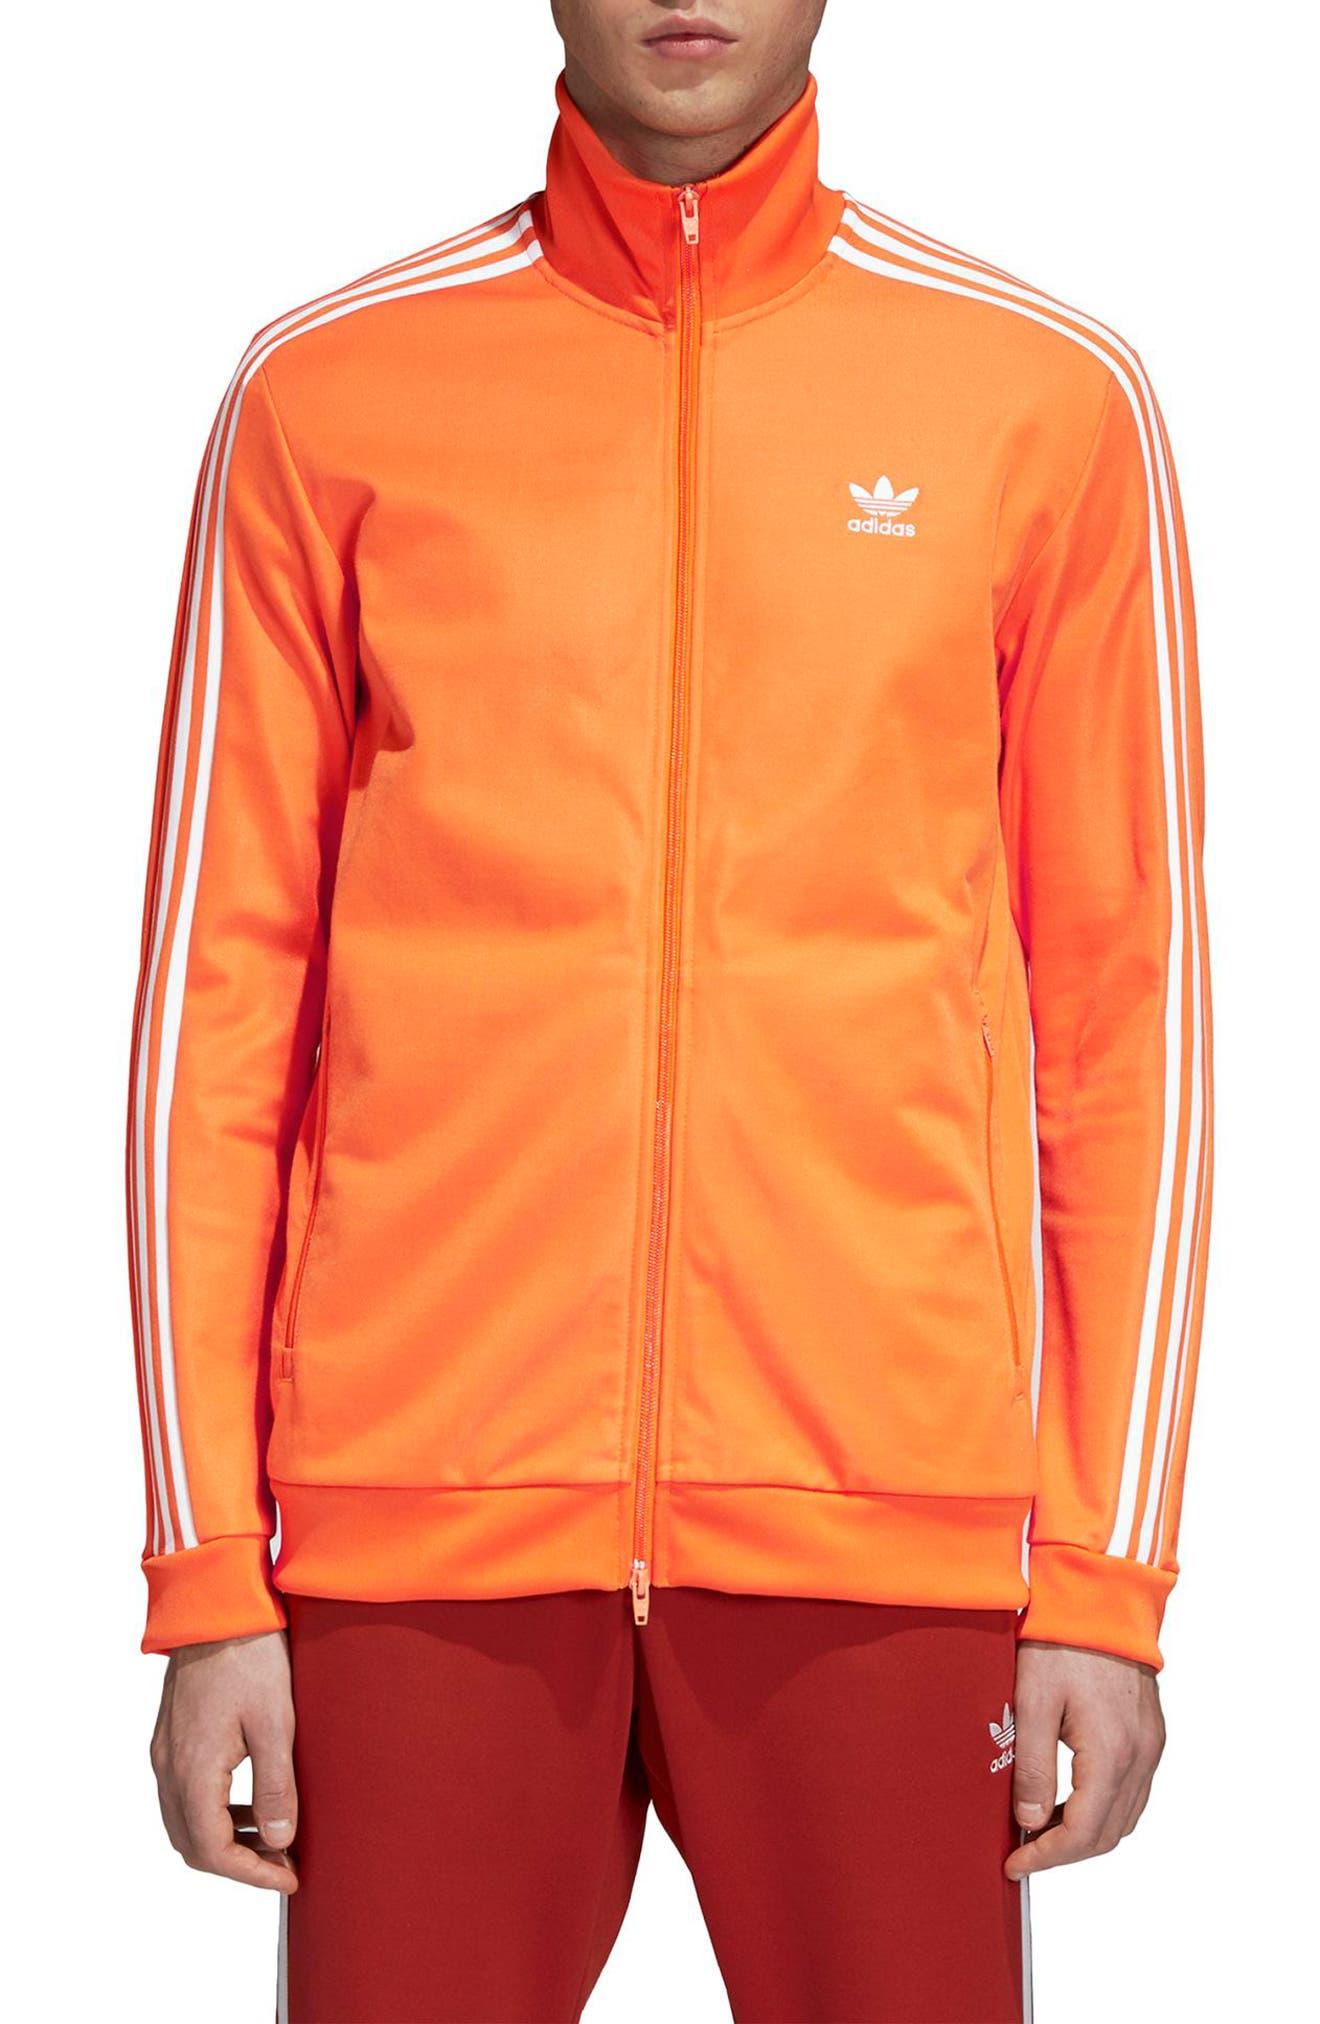 BB Track Jacket,                             Main thumbnail 1, color,                             BRIGHT ORANGE